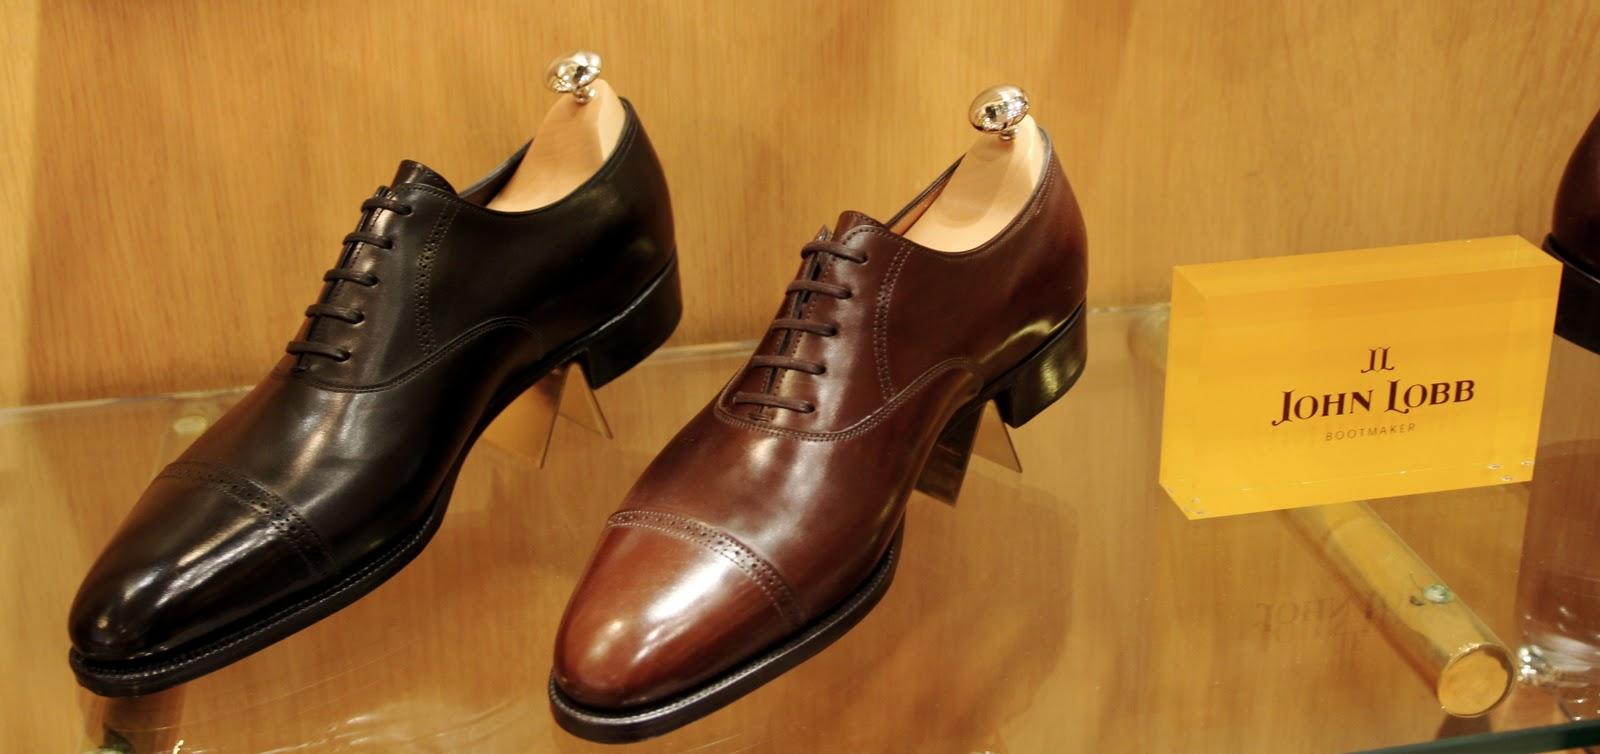 "John Lobb Shoes >> LYRA MAG.: JOHN LOBB's COLLABORATION WITH SWIMS ""BALMORAL"" GALOSHES"